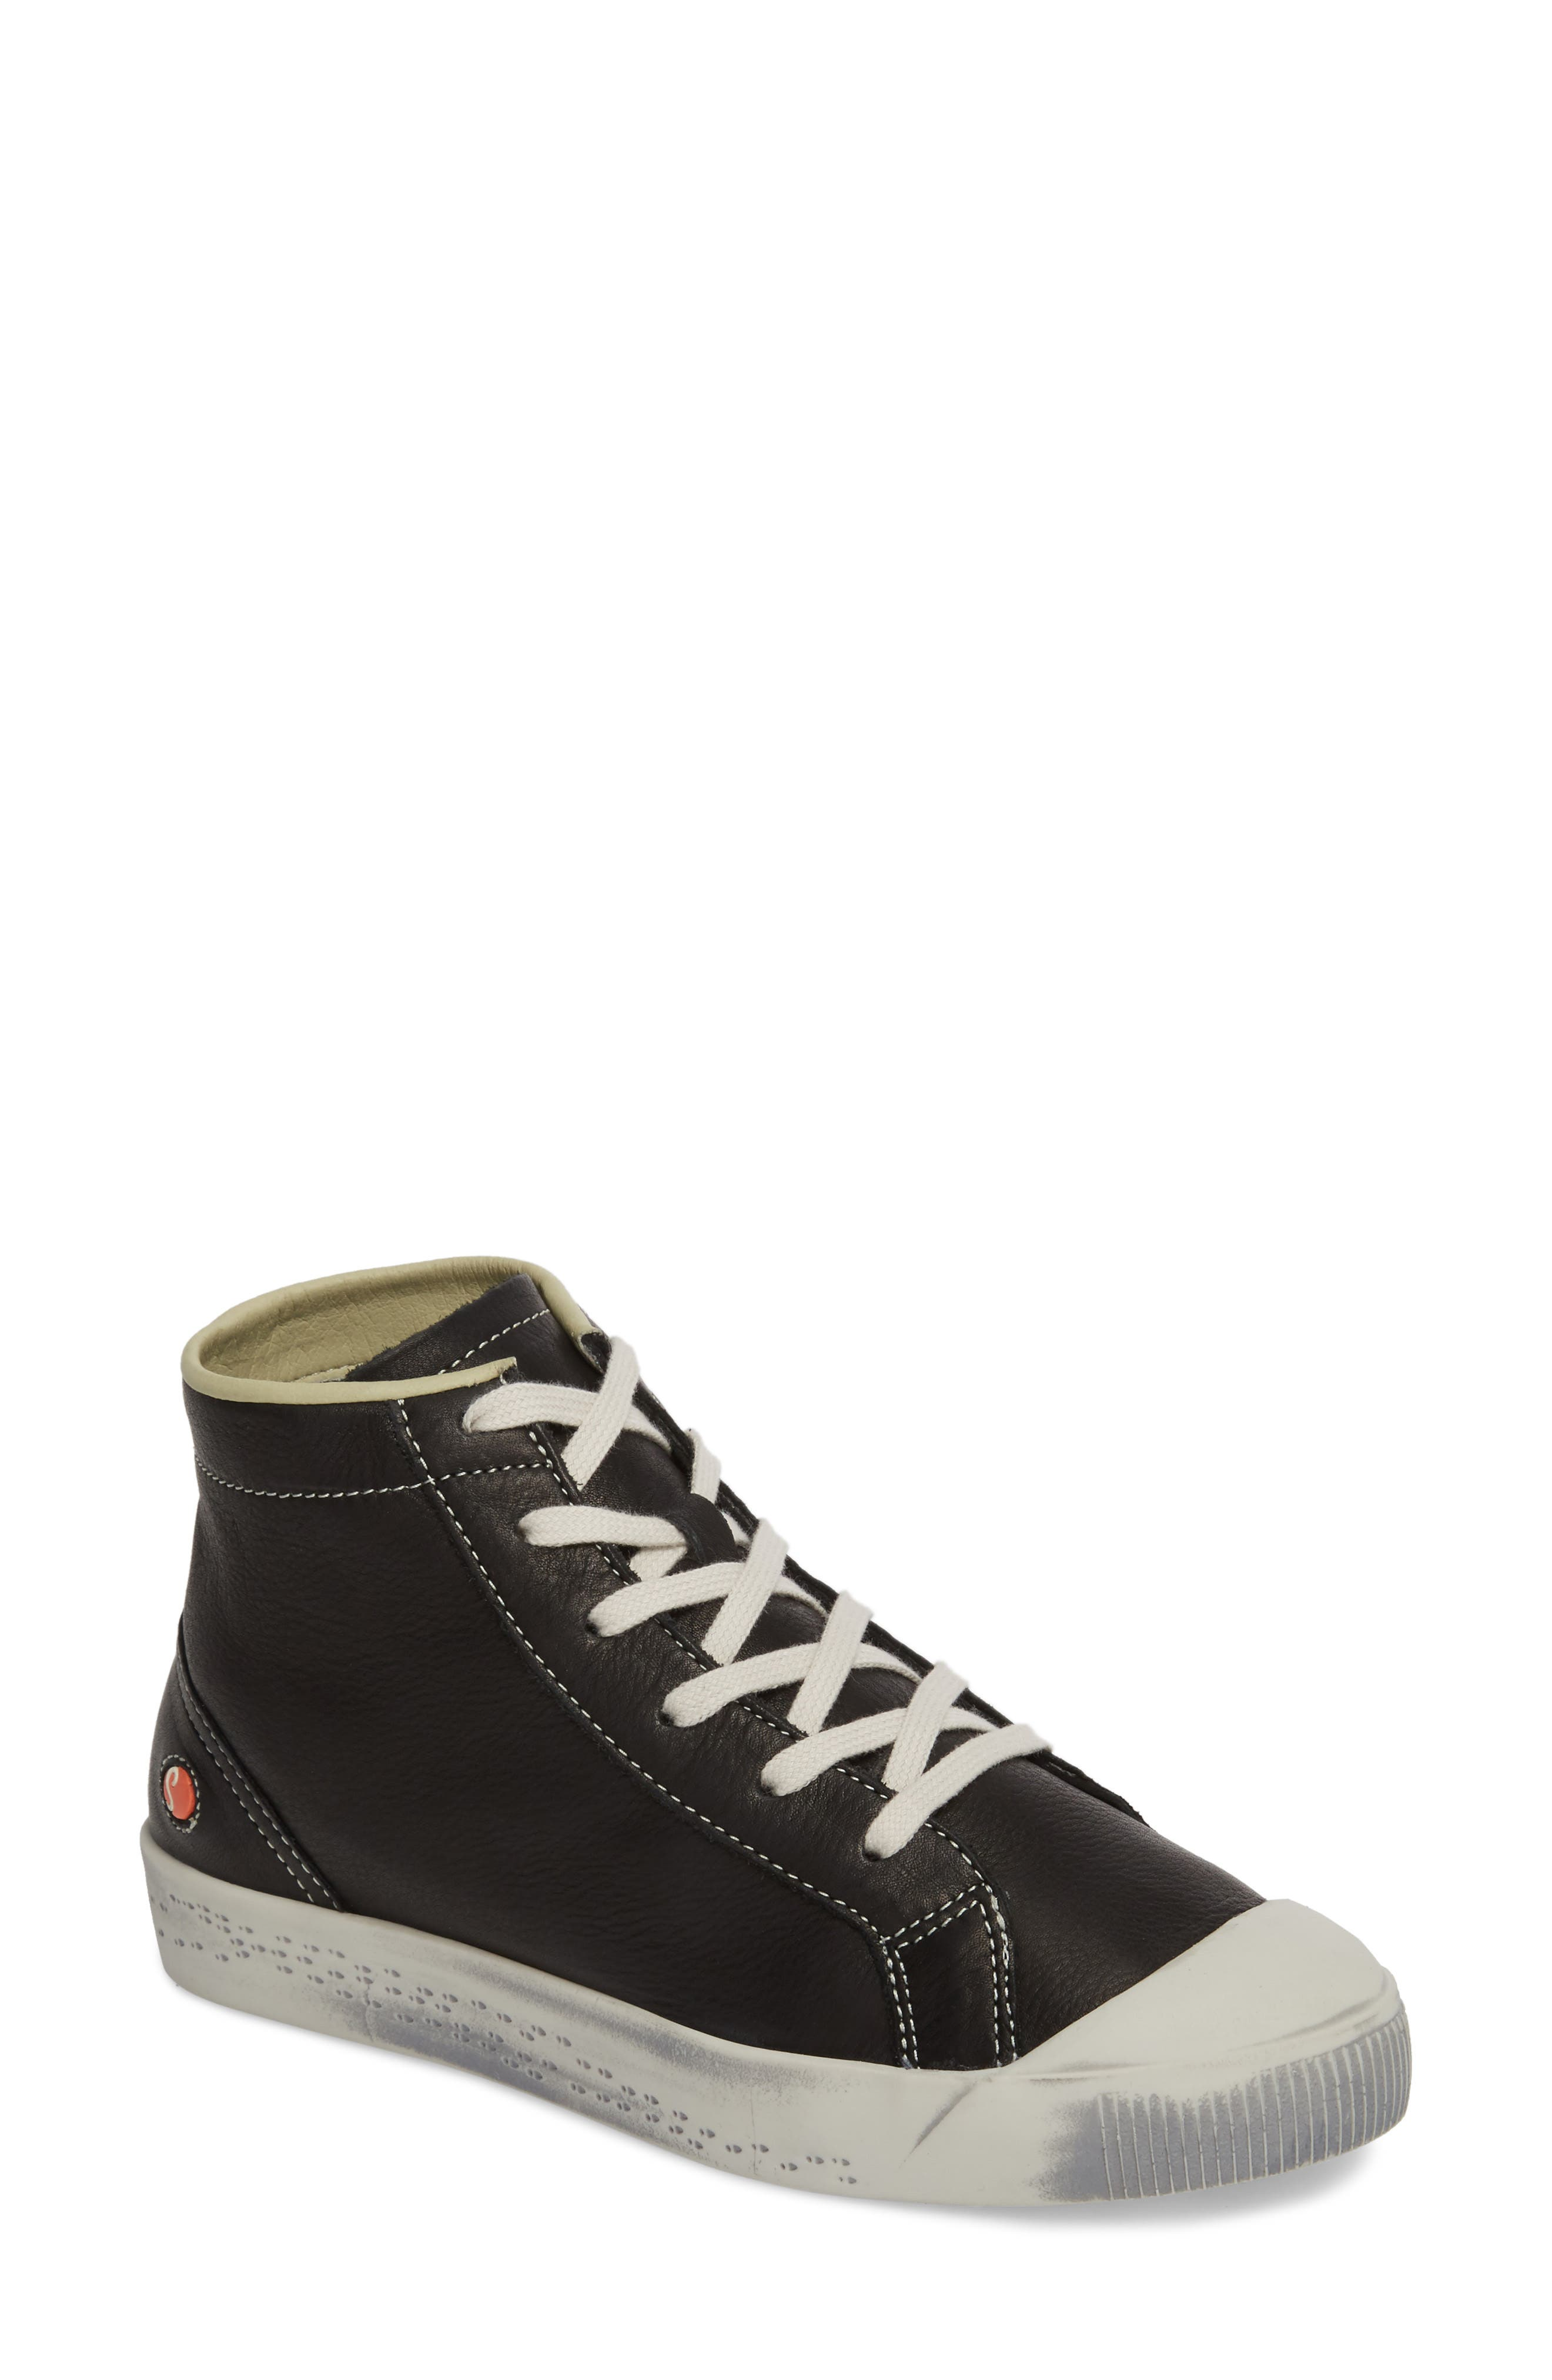 Kip High Top Sneaker,                             Main thumbnail 1, color,                             001